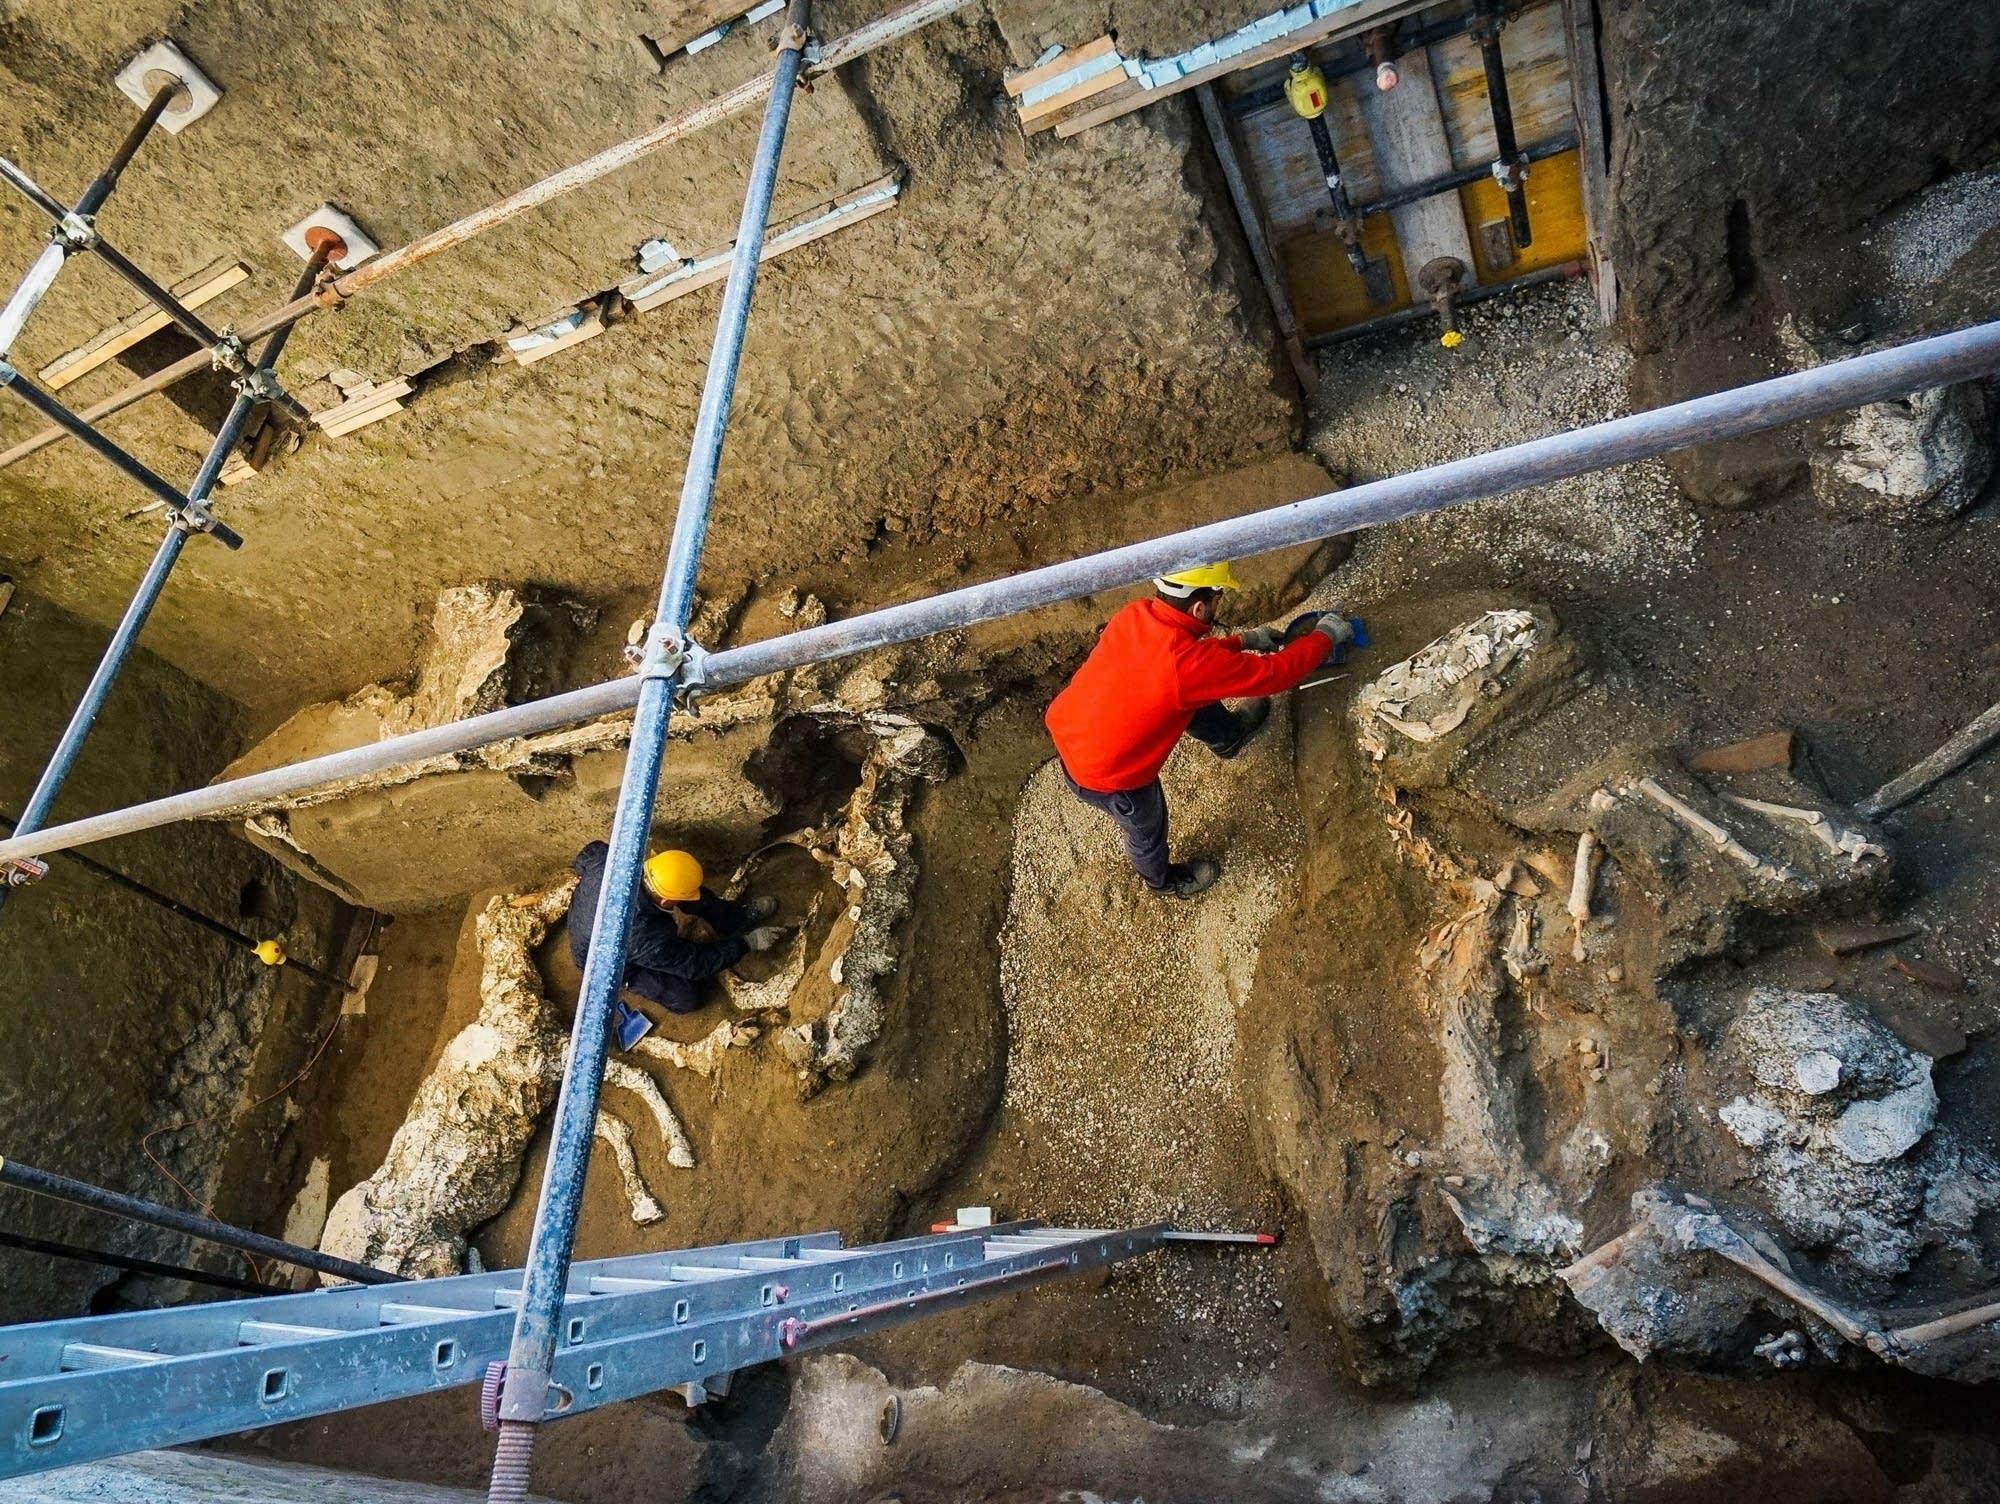 Hasil gambar untuk Petrified horse remains found in stable near Pompeii